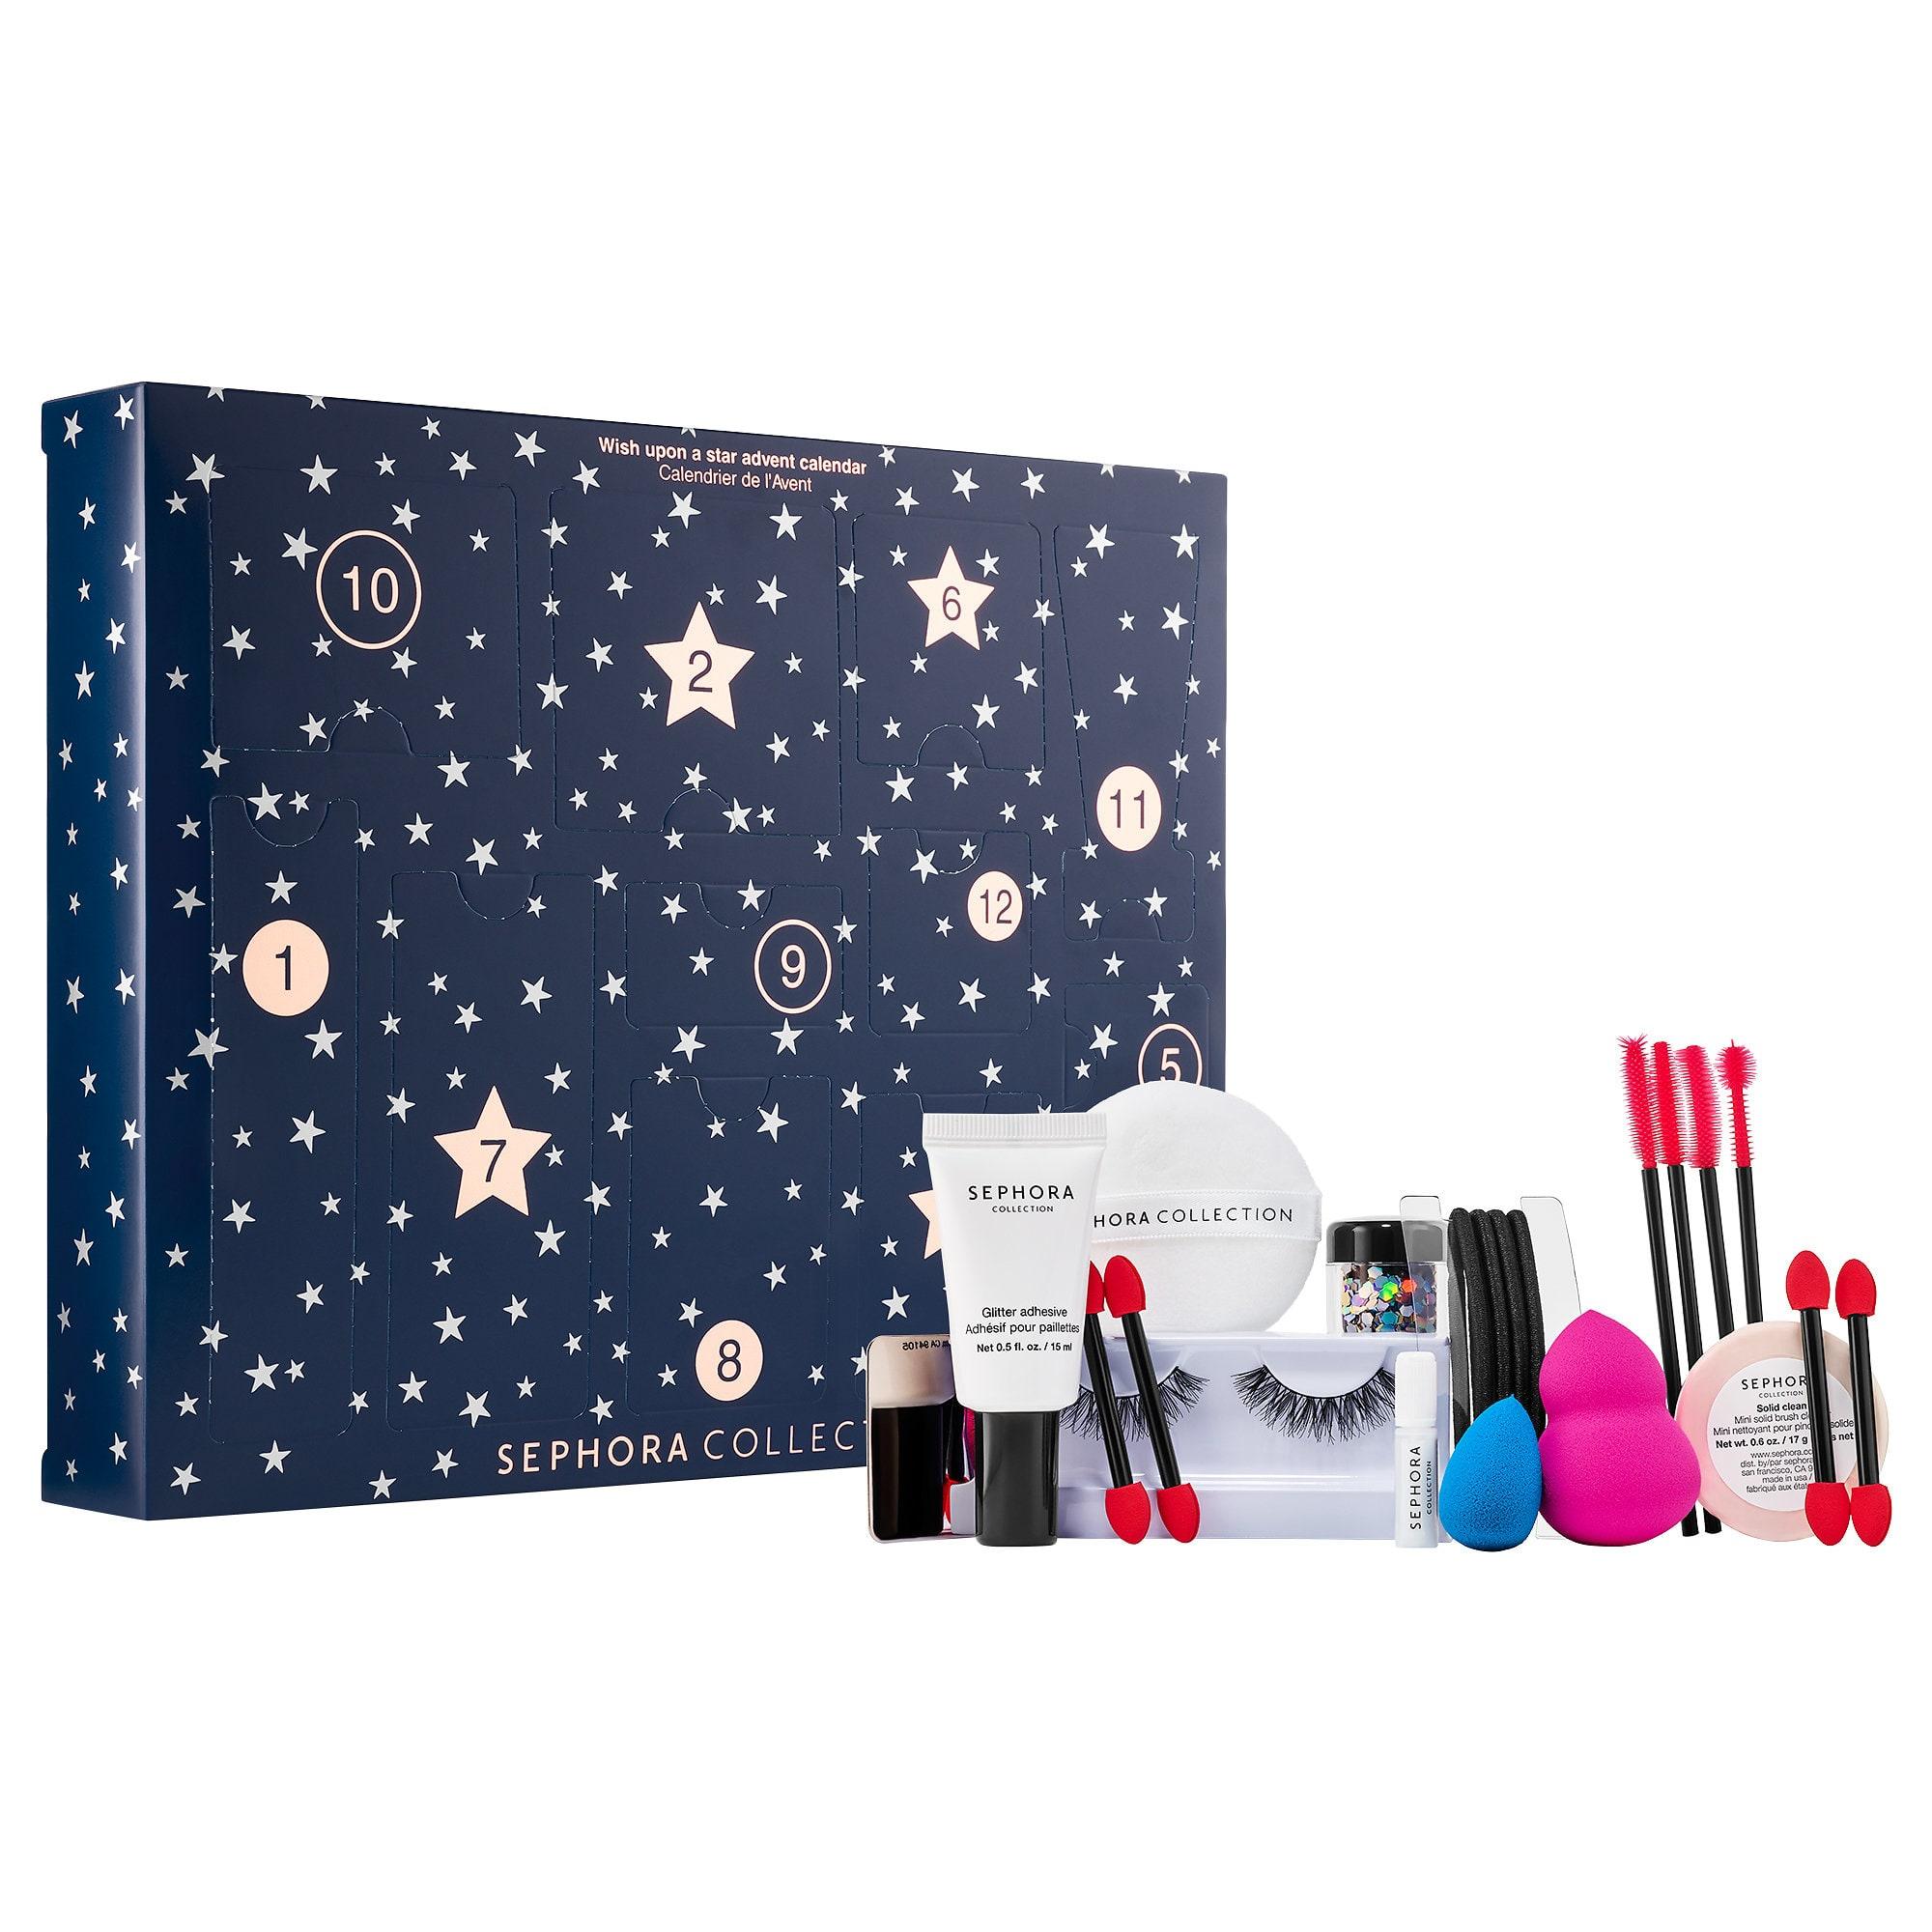 Sephora Collection Wish Upon A Star Advent Calendar Makeup Advent Calendar Beauty Advent Calendar Sephora